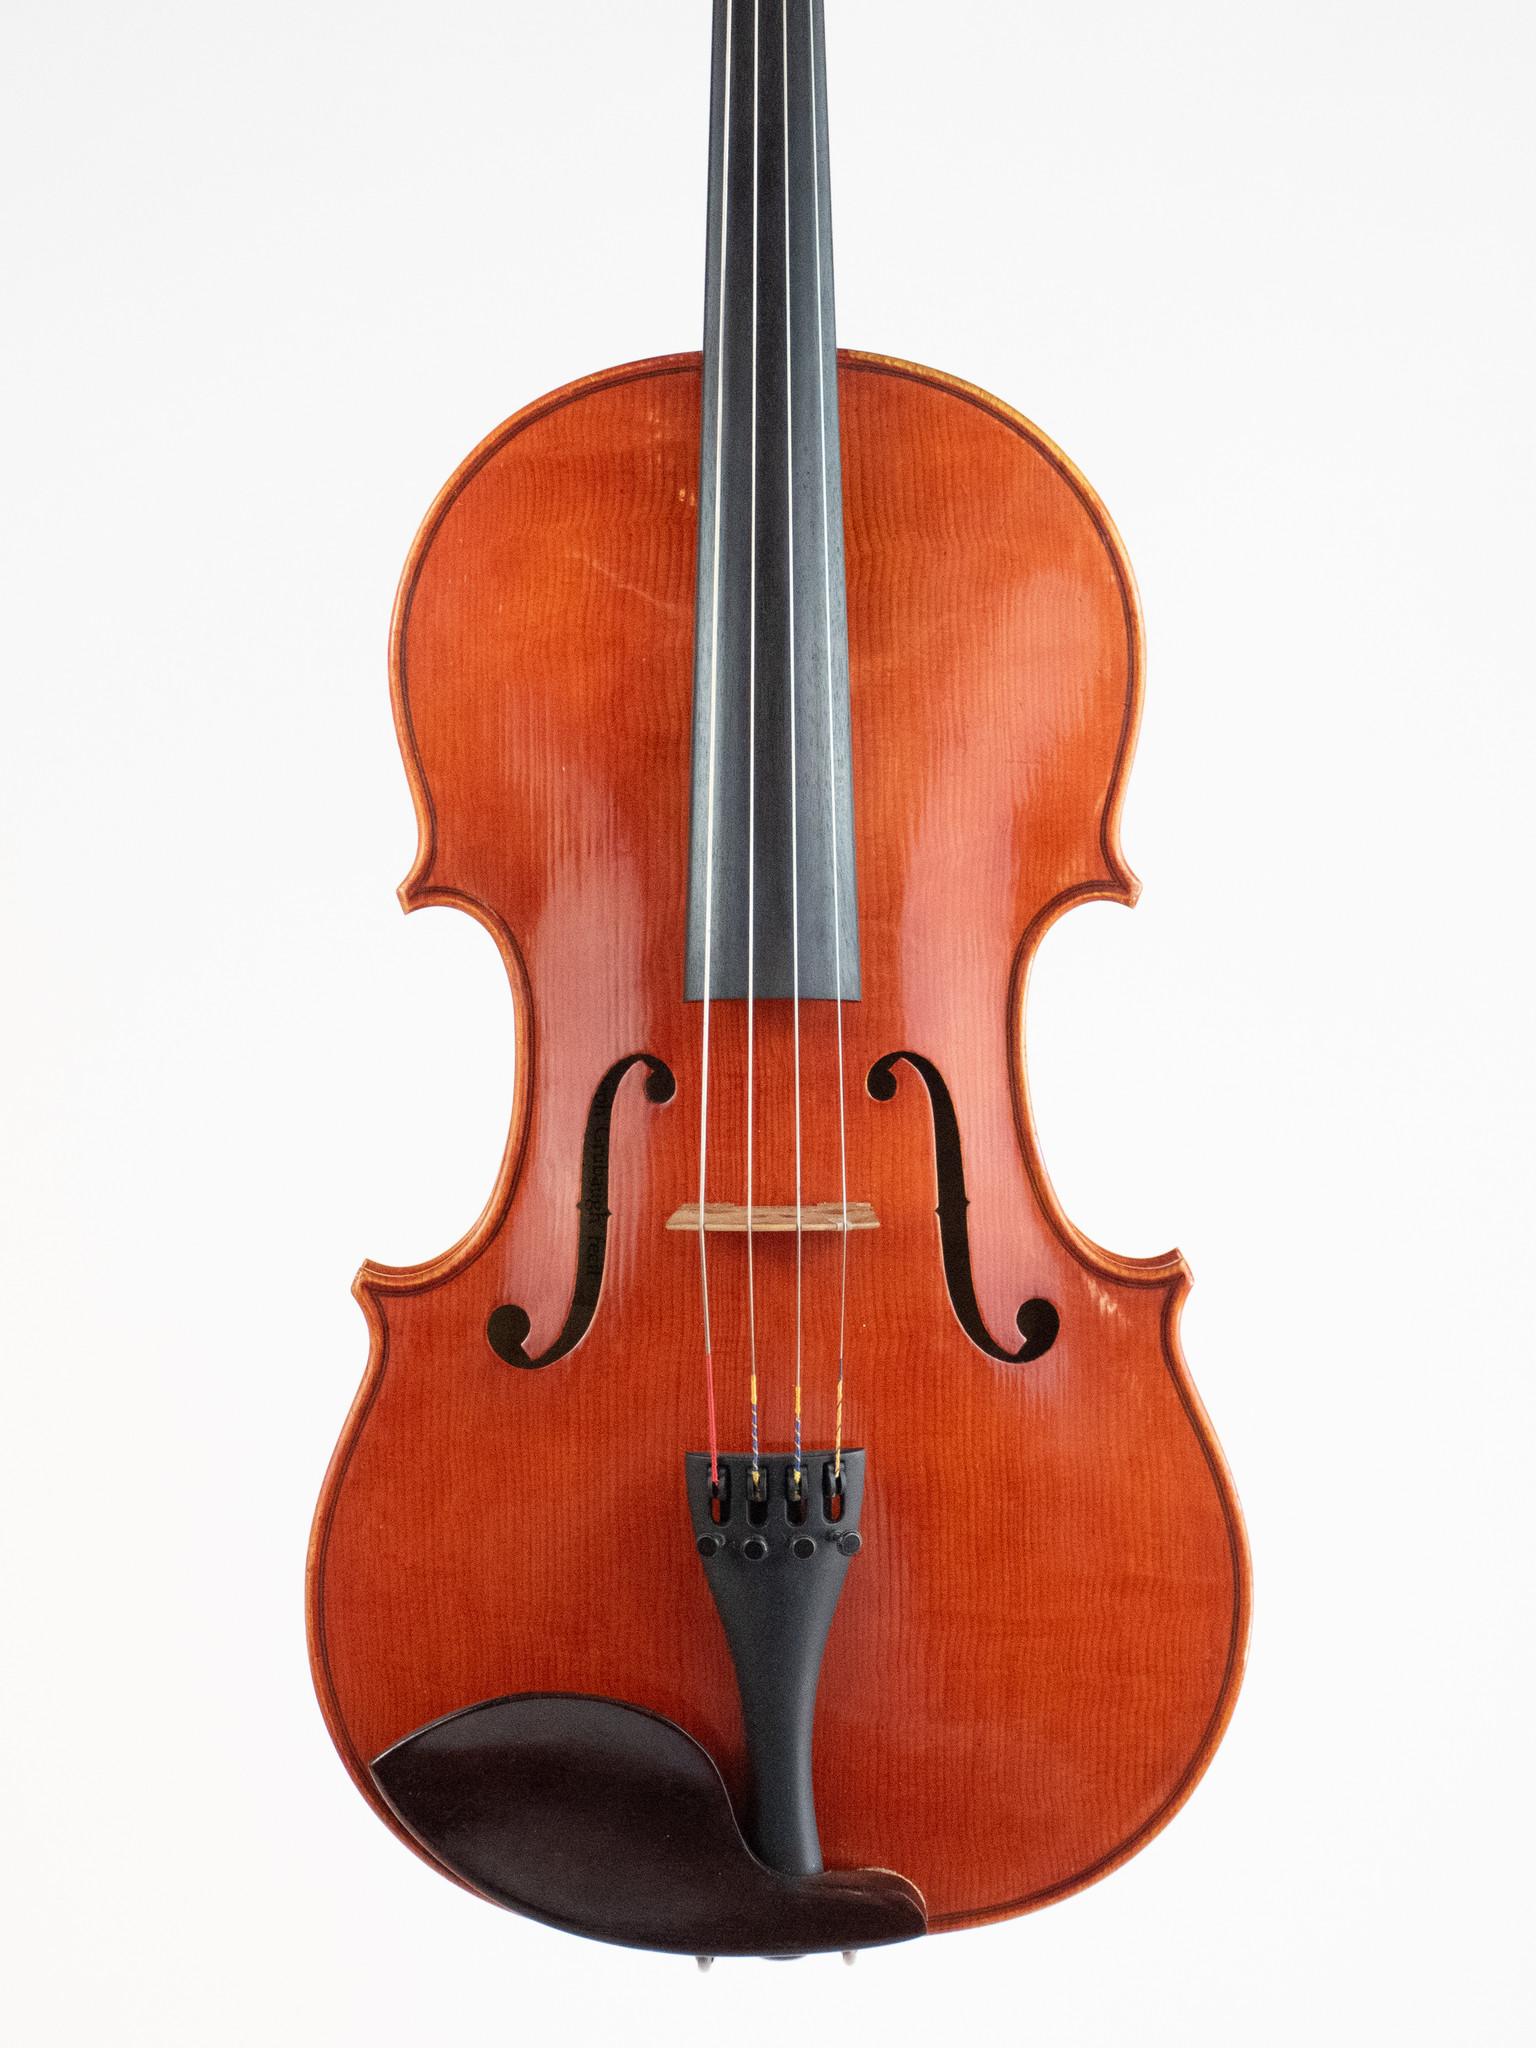 "Joseph Grubaugh 16 1/4"" viola, 1982, San Francisco, USA"